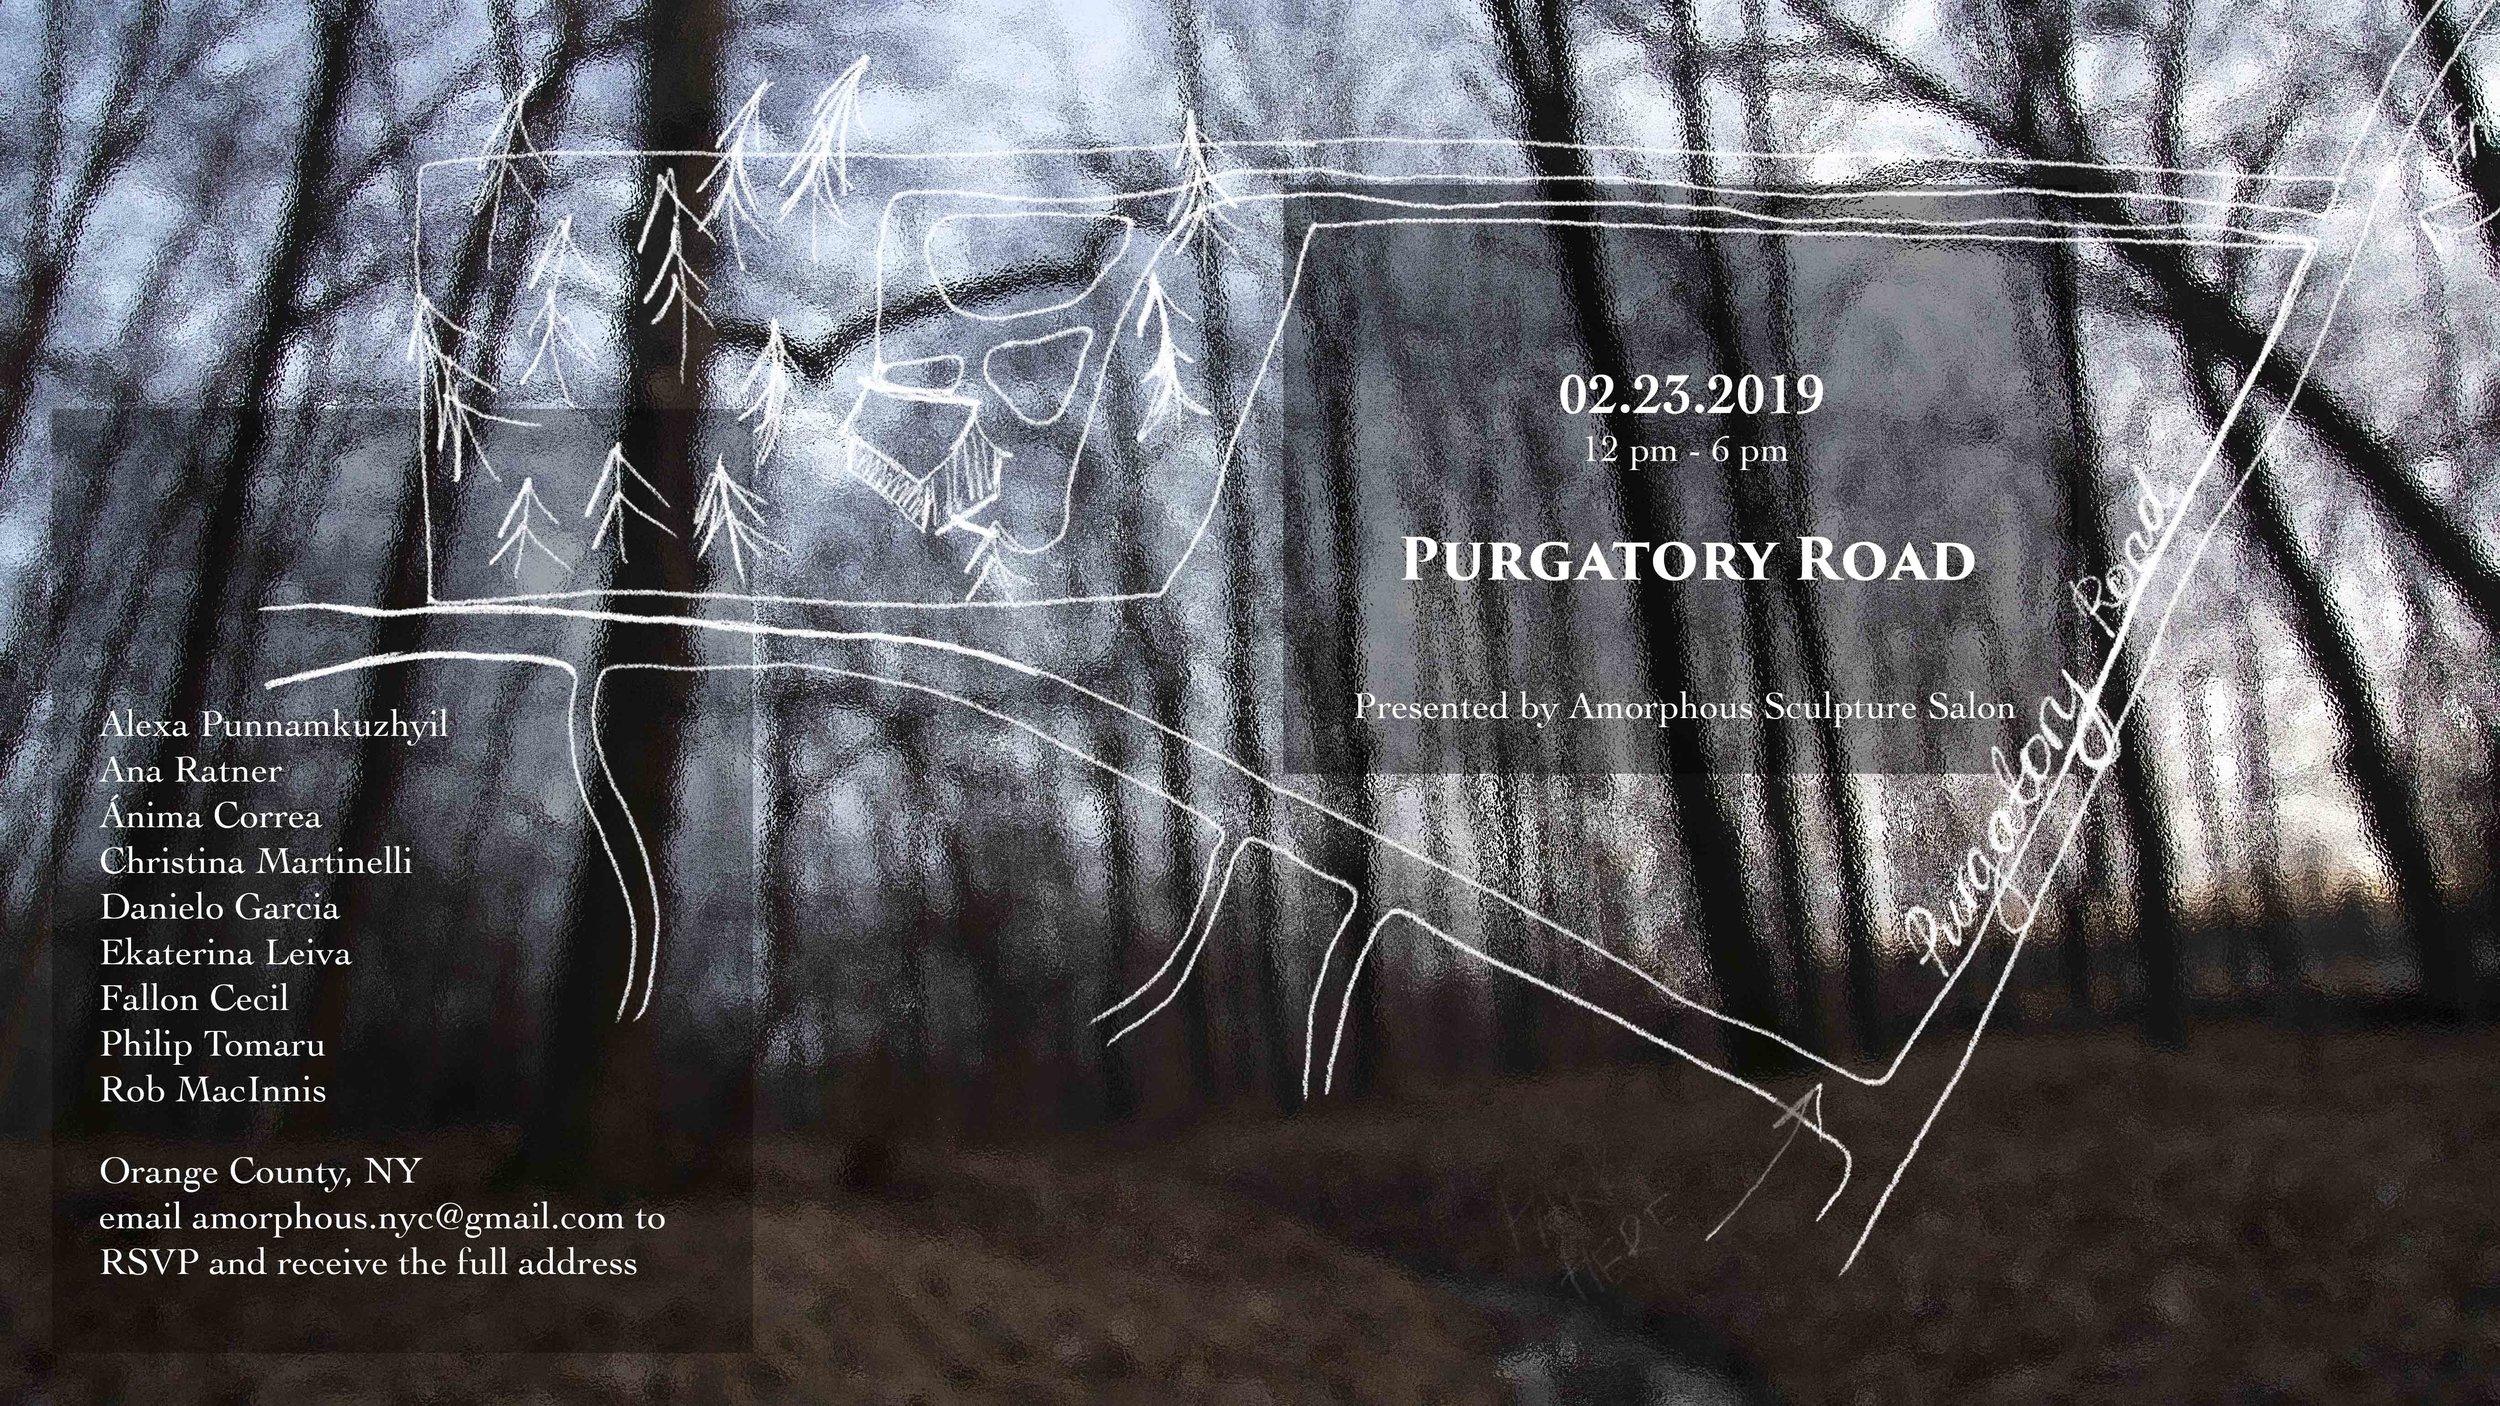 Facebook event_Purgatory_Road.jpg